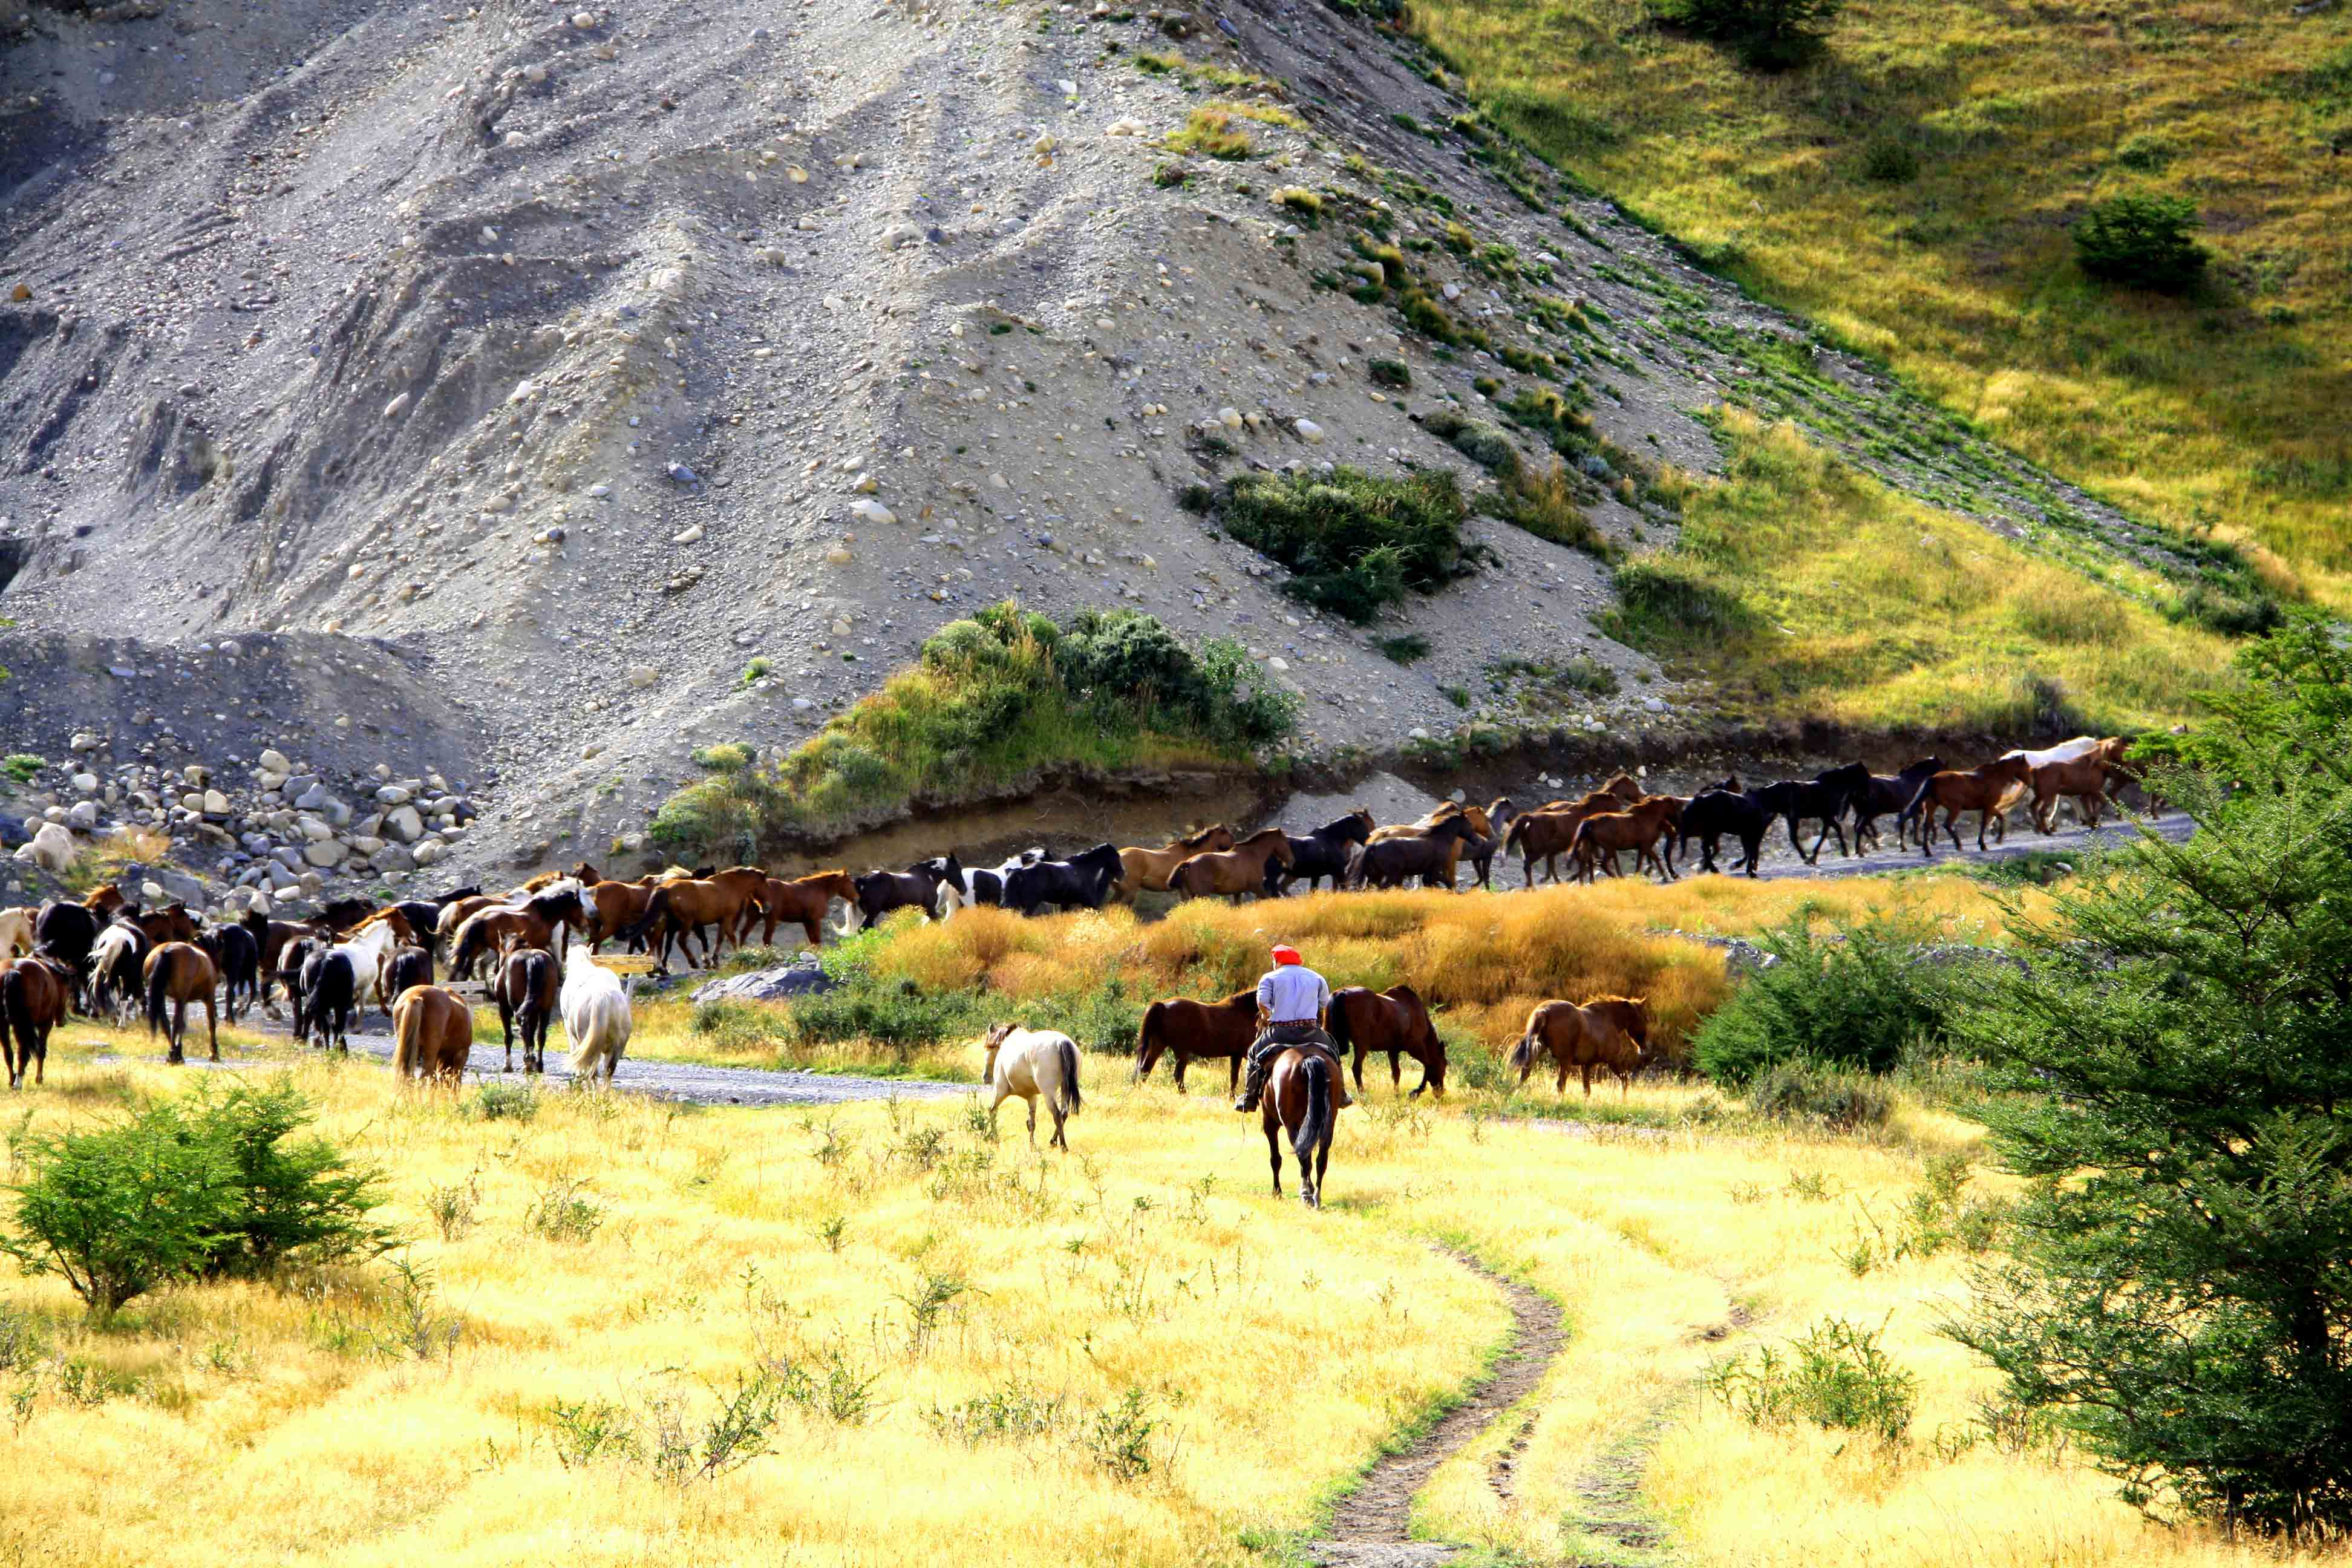 Gauchos torres del paine on their horses